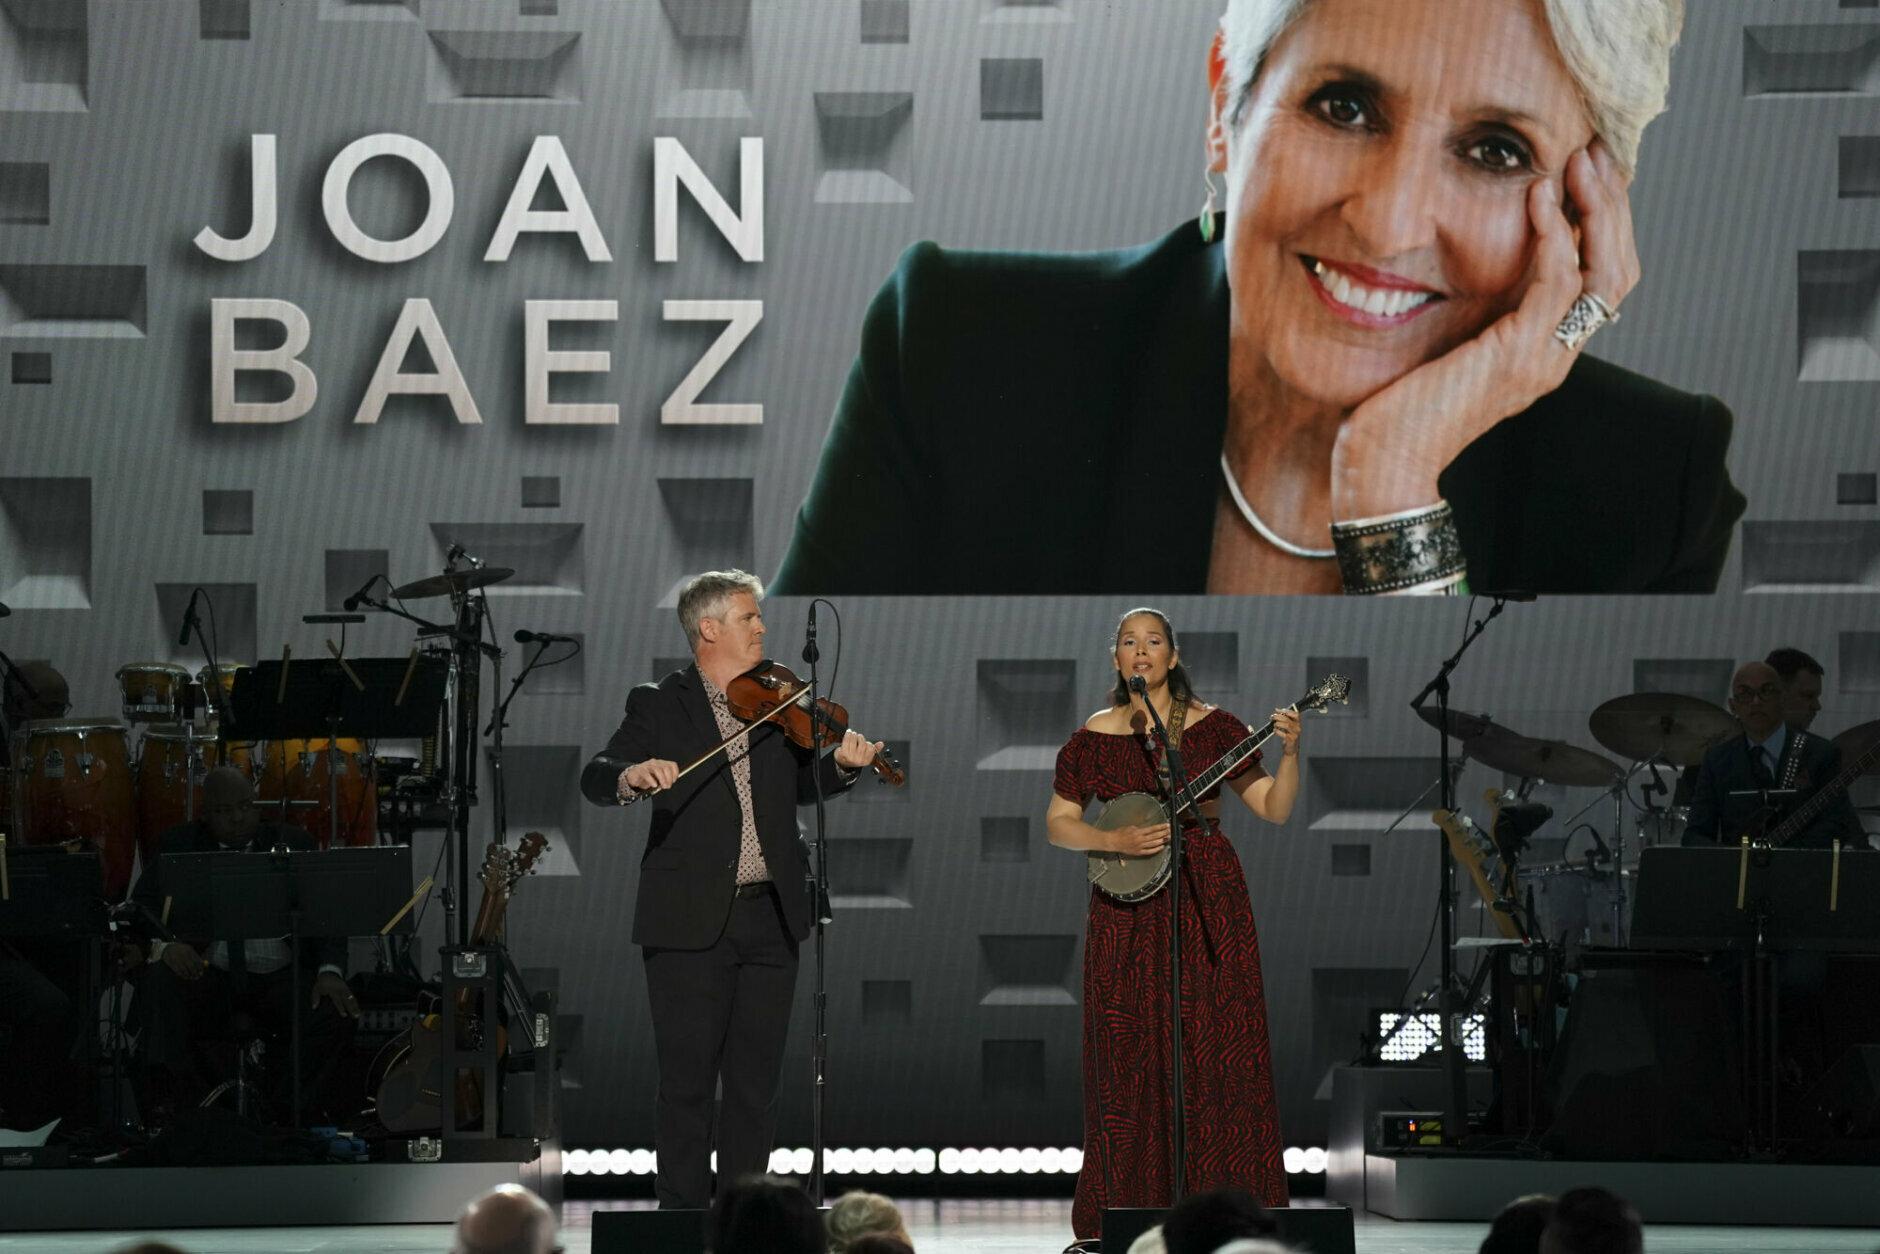 <p>Dirk Powell and Rhiannon Giddens perform. (Gail Schulman/CBS)</p>